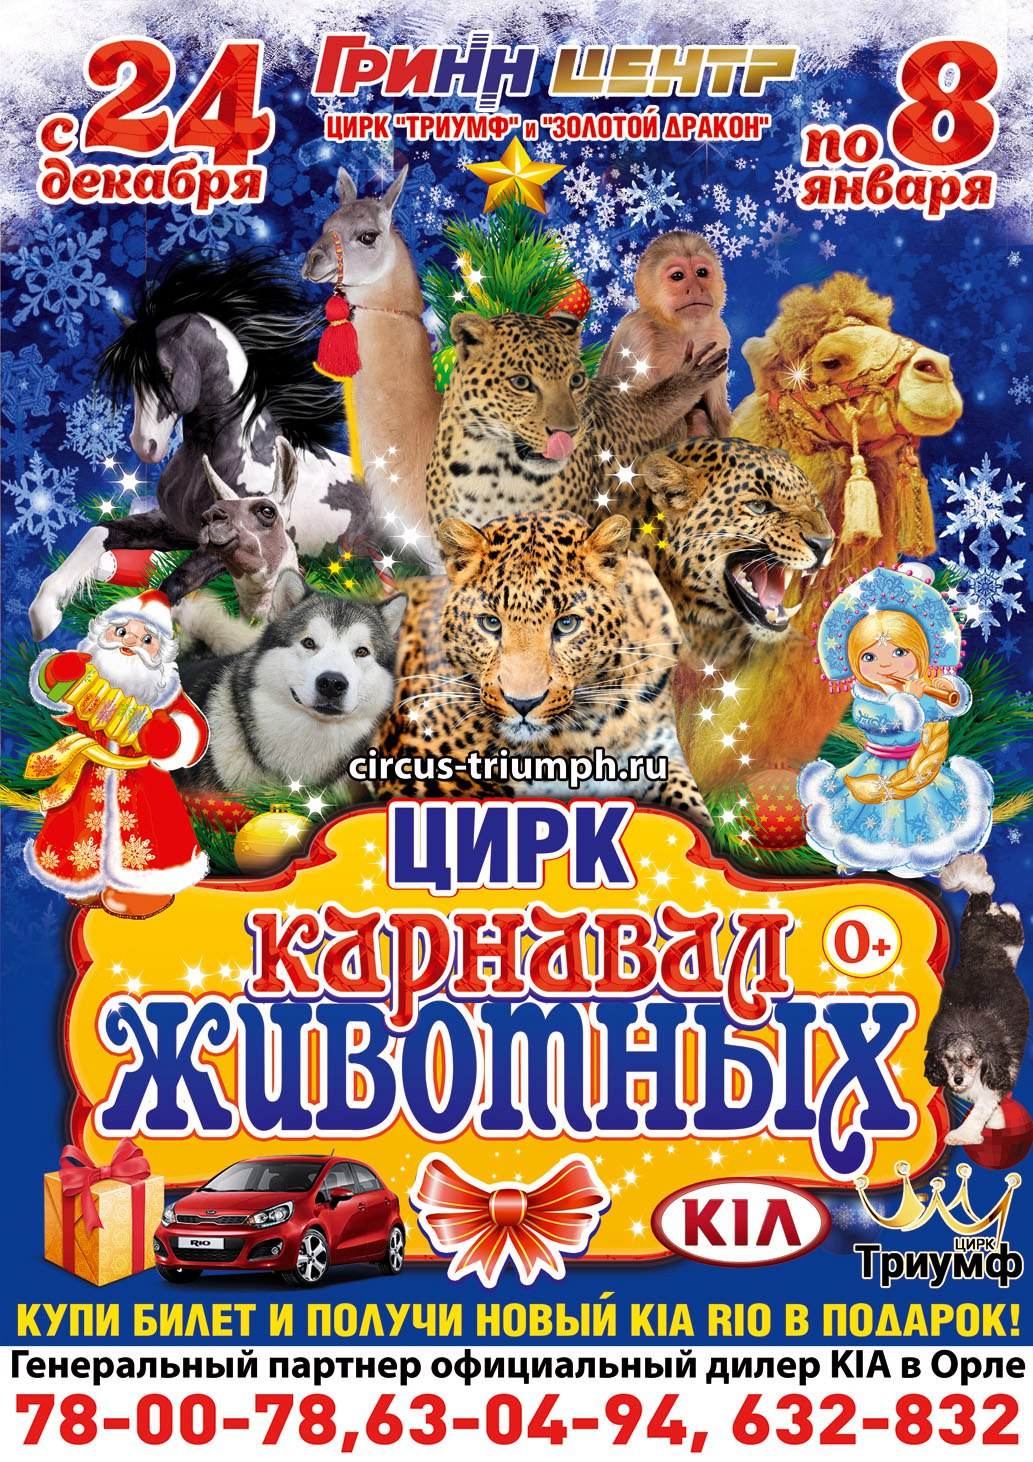 Цирк «Карнавал животных»